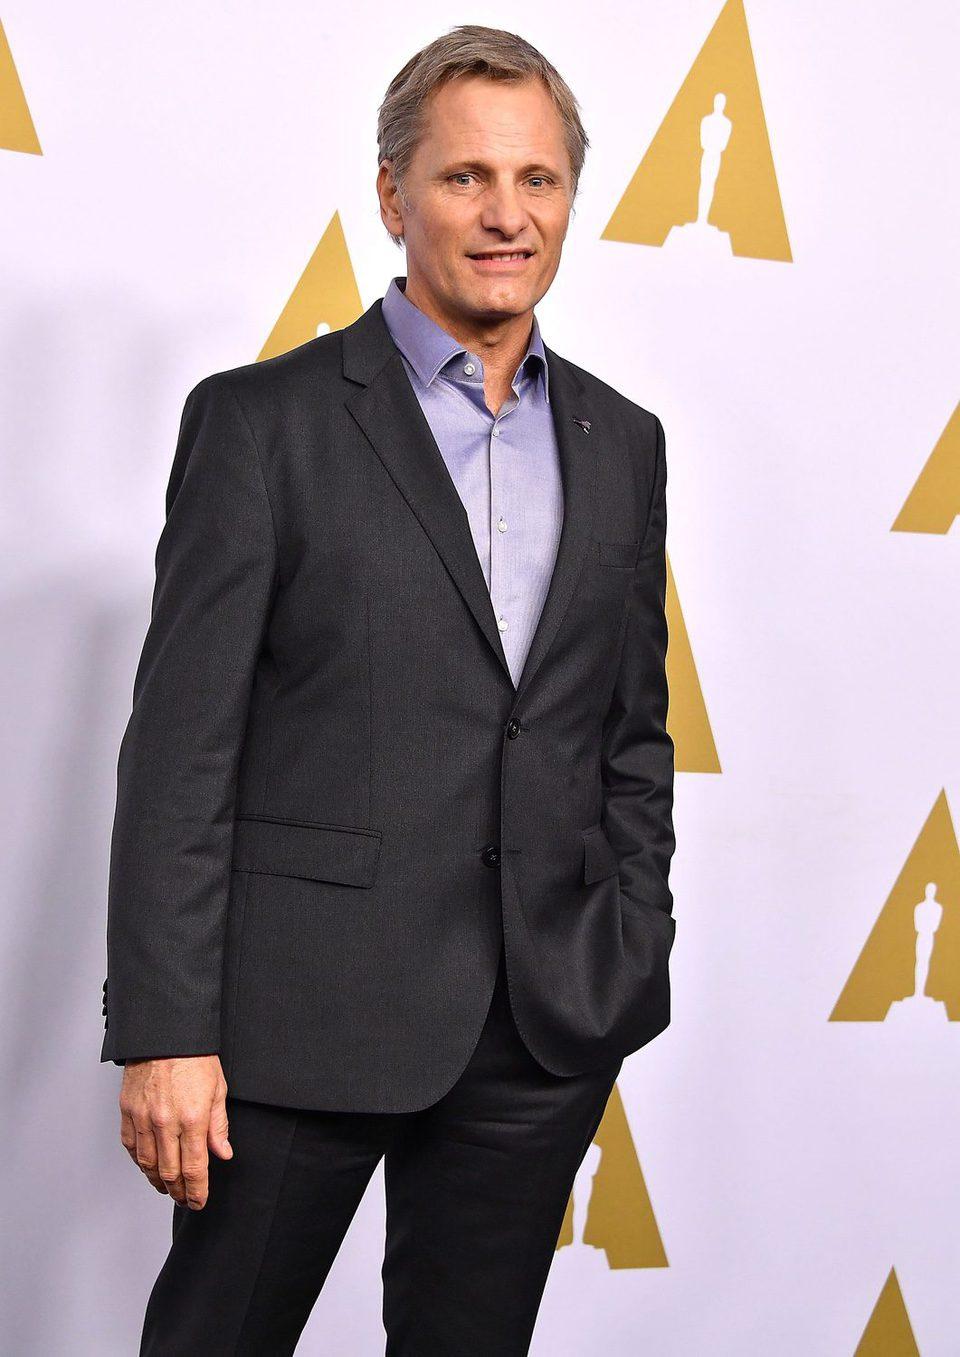 Viggo Mortensen at the 2017 Annual Academy Awards Nominee Luncheon